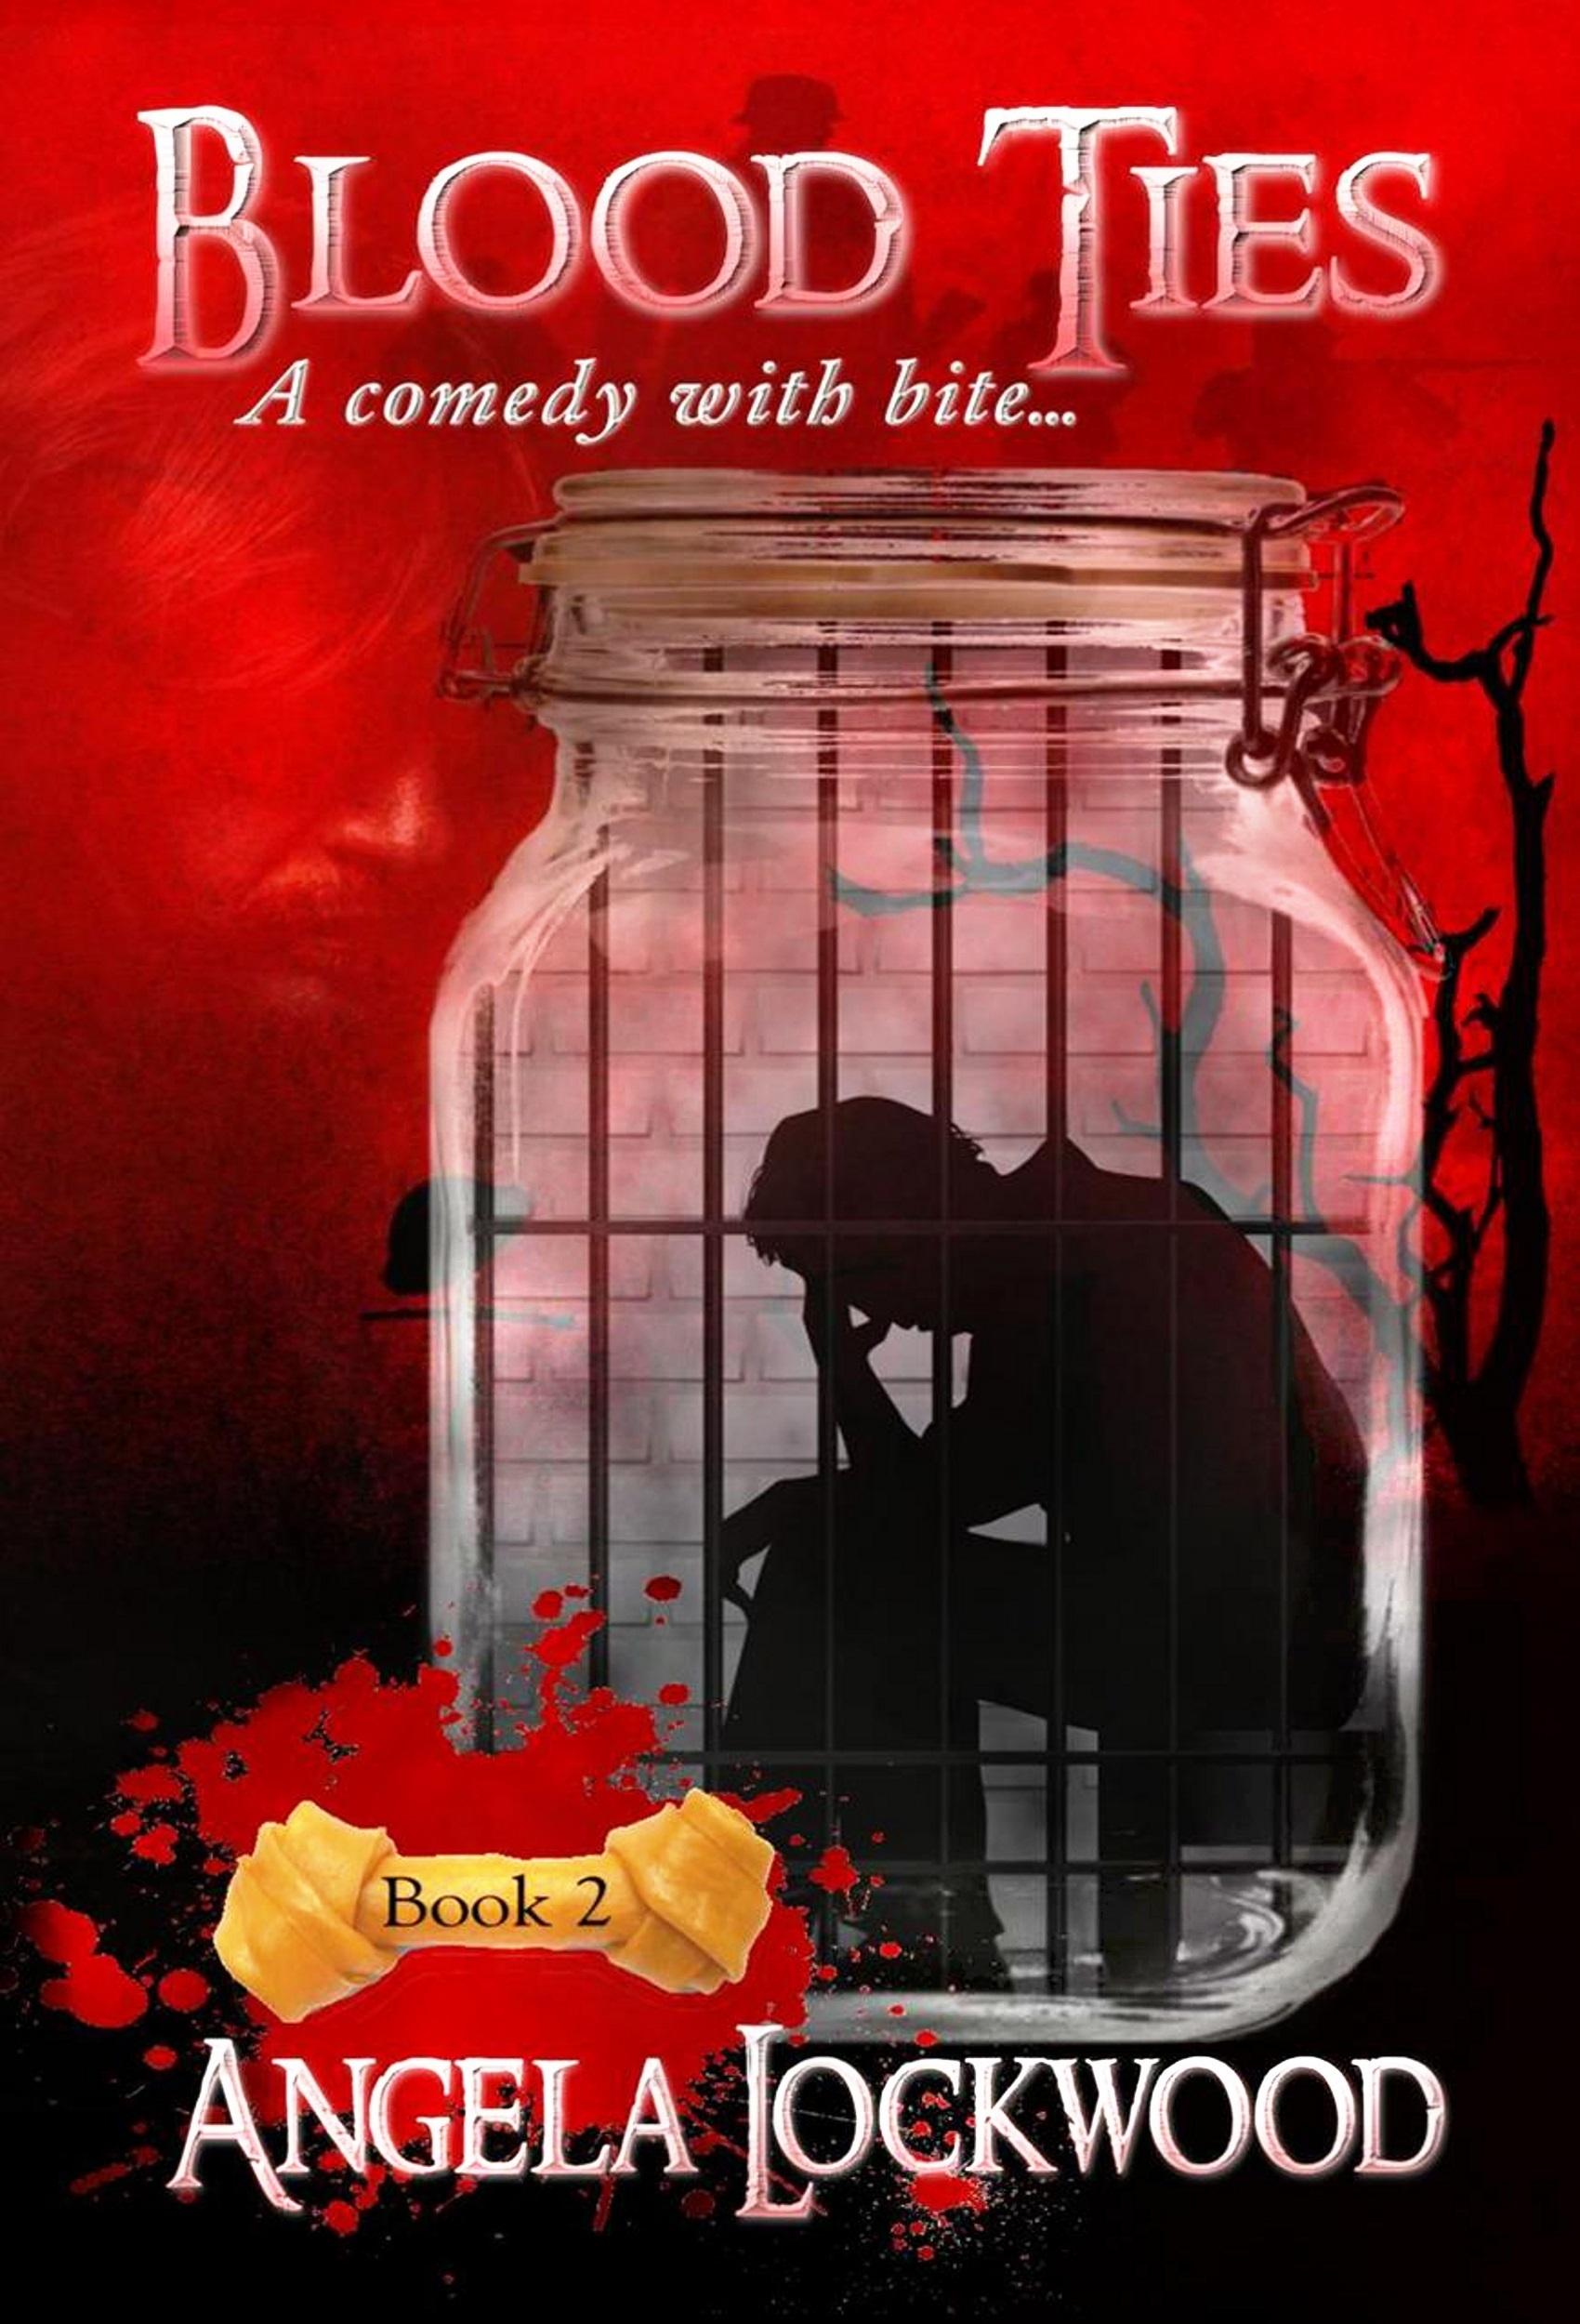 Blood Ties, Language in the Blood Book 2 Angela Lockwood